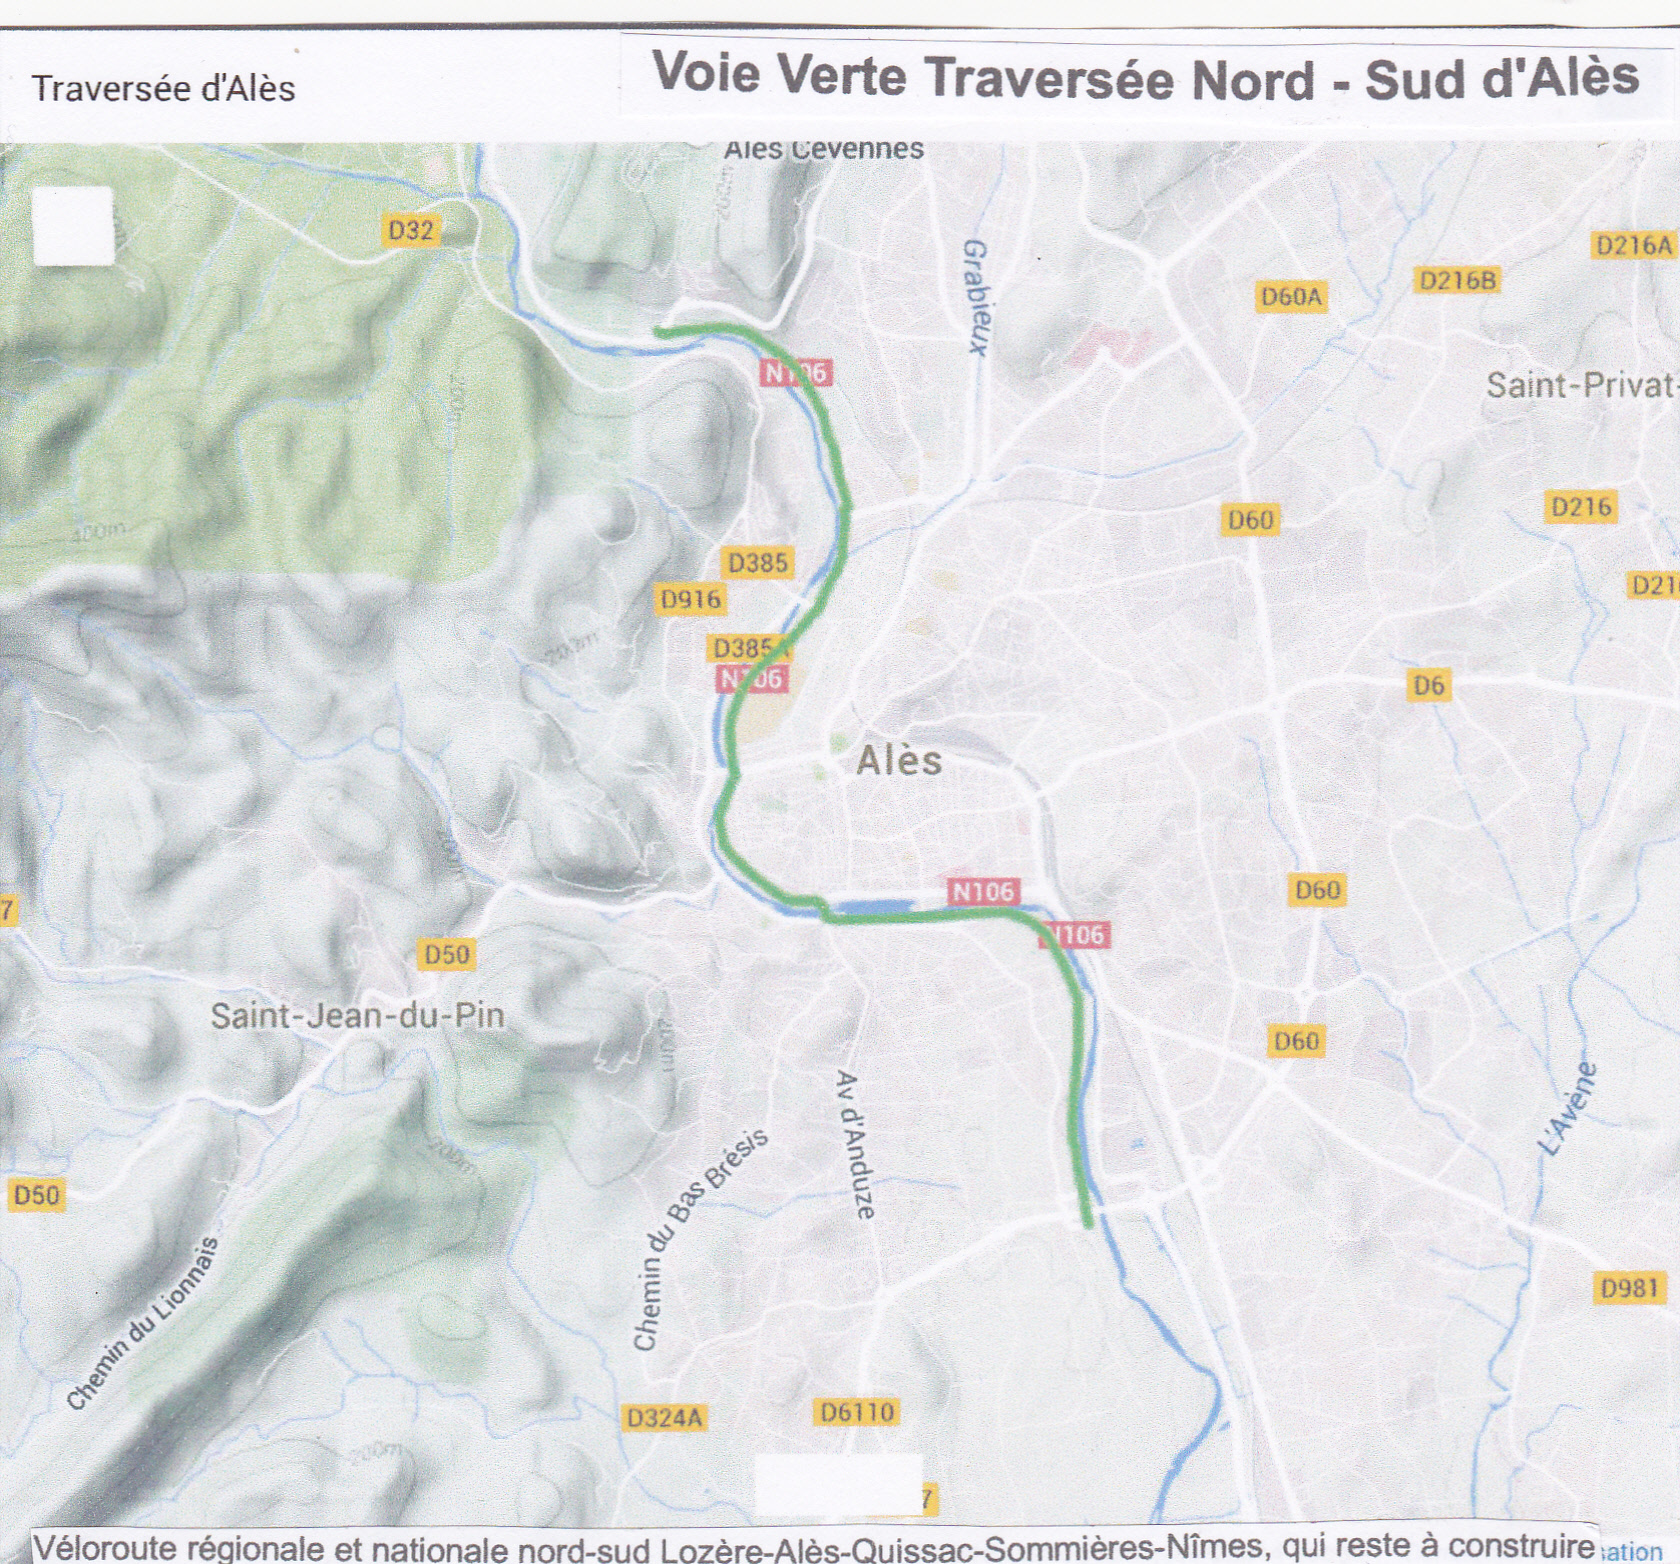 VV Traversee d'Alu00E8s Plan